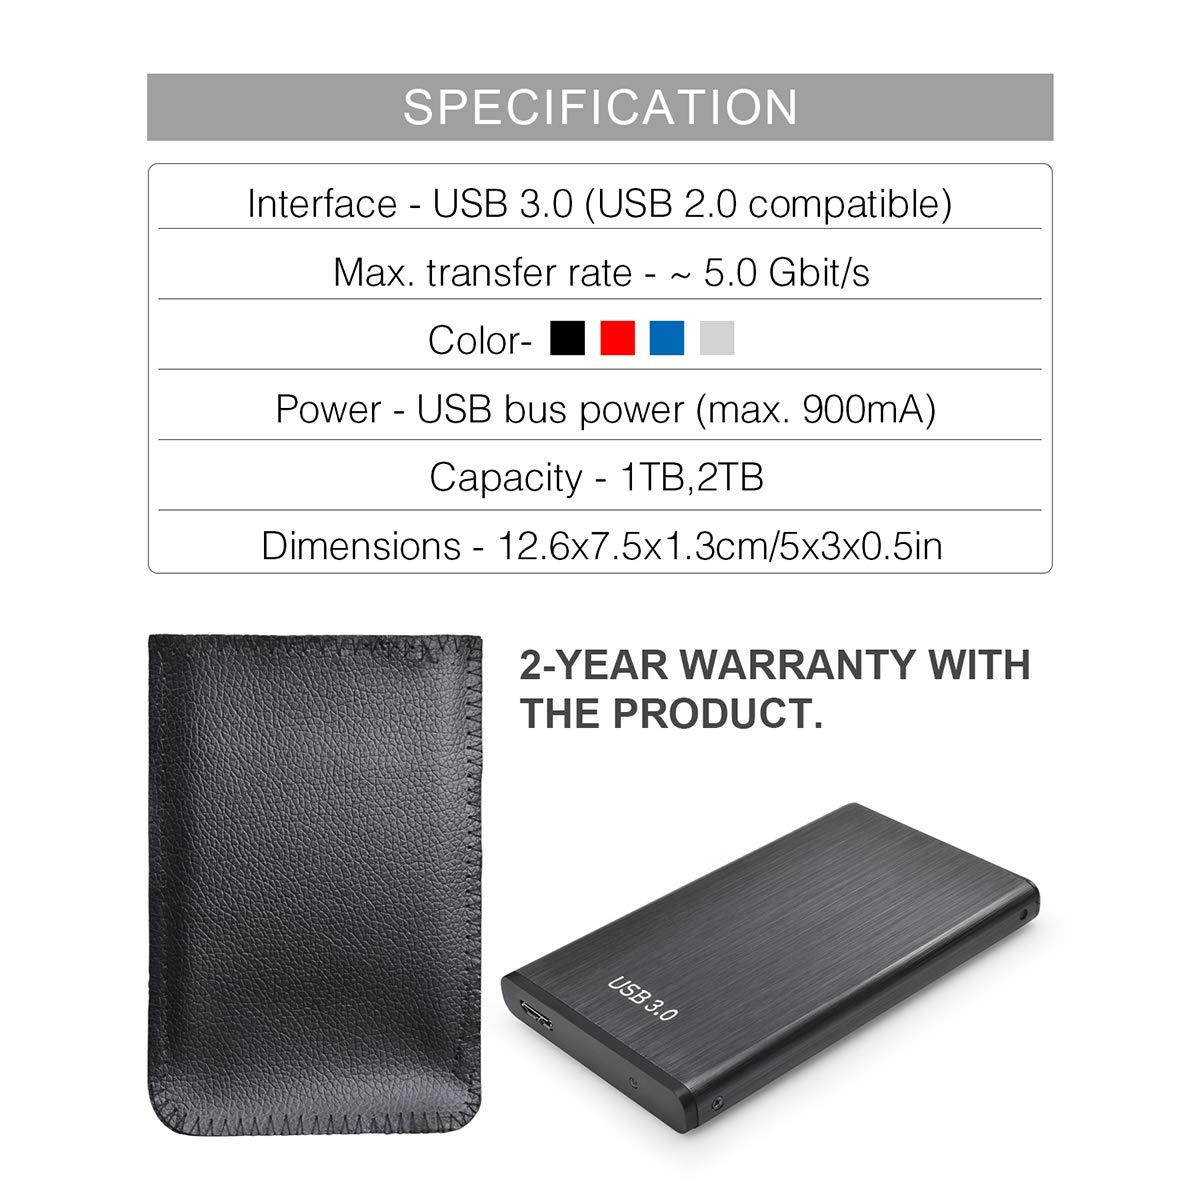 MacBook PS4 Chromebook 2TB,Negro Disco Duro Externo 2 TB Mac,Xbox Disco Duro Externo USB3.0 para PC